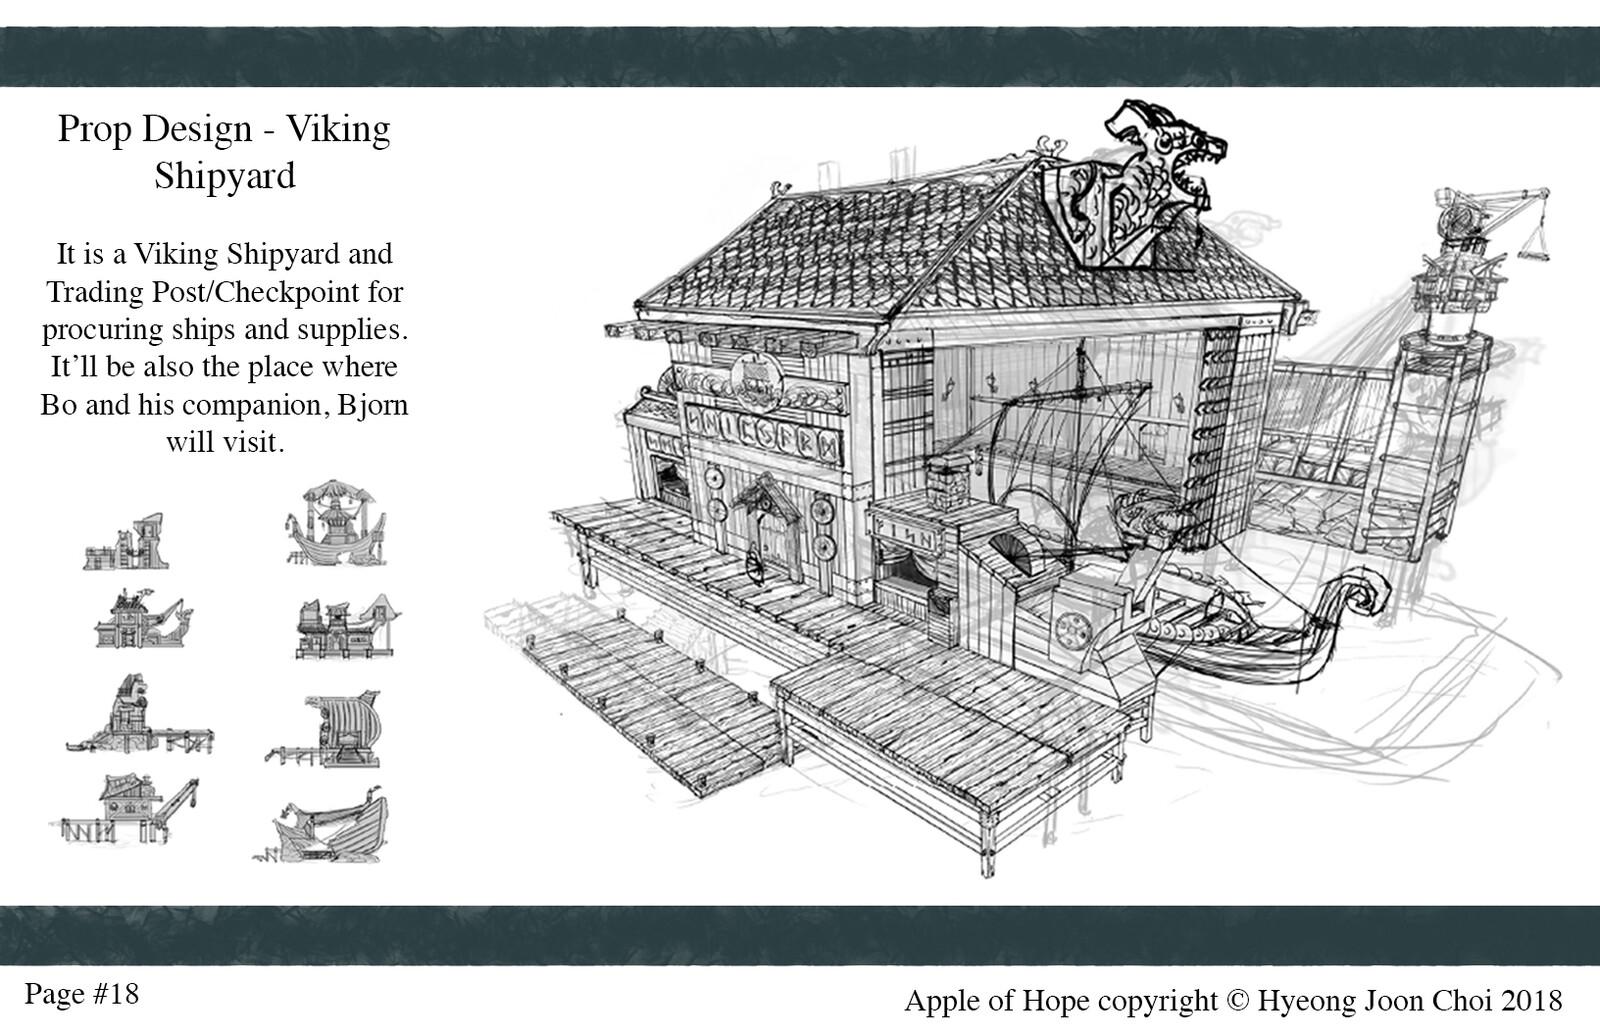 Production Design: Viking Shipyard